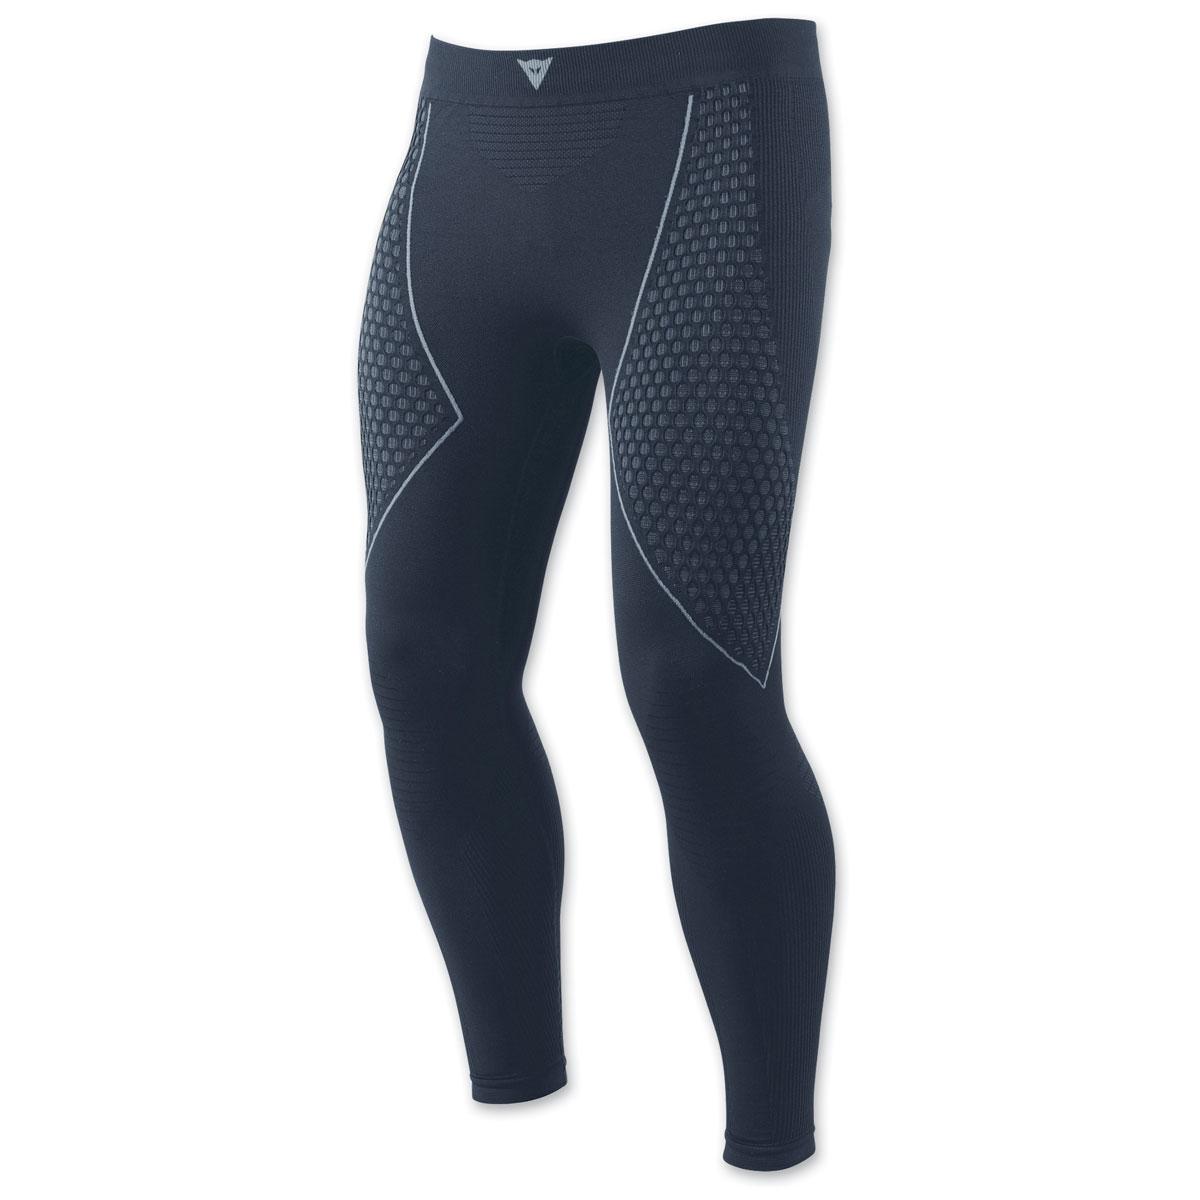 Dainese Men's D-Core Aero Black/Gray Pants